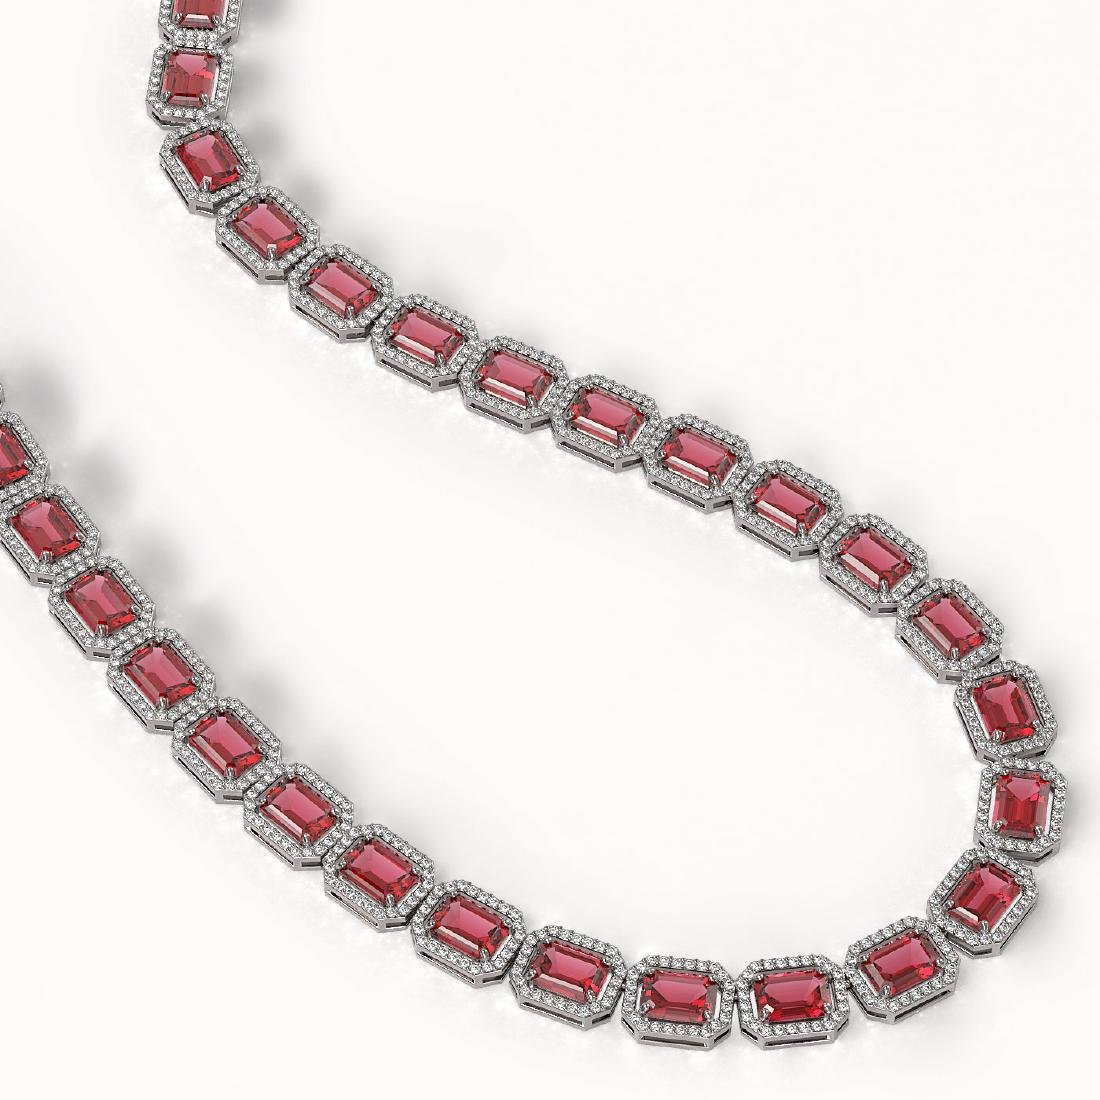 60.49 CTW Tourmaline & Diamond Halo Necklace 10K White - 2